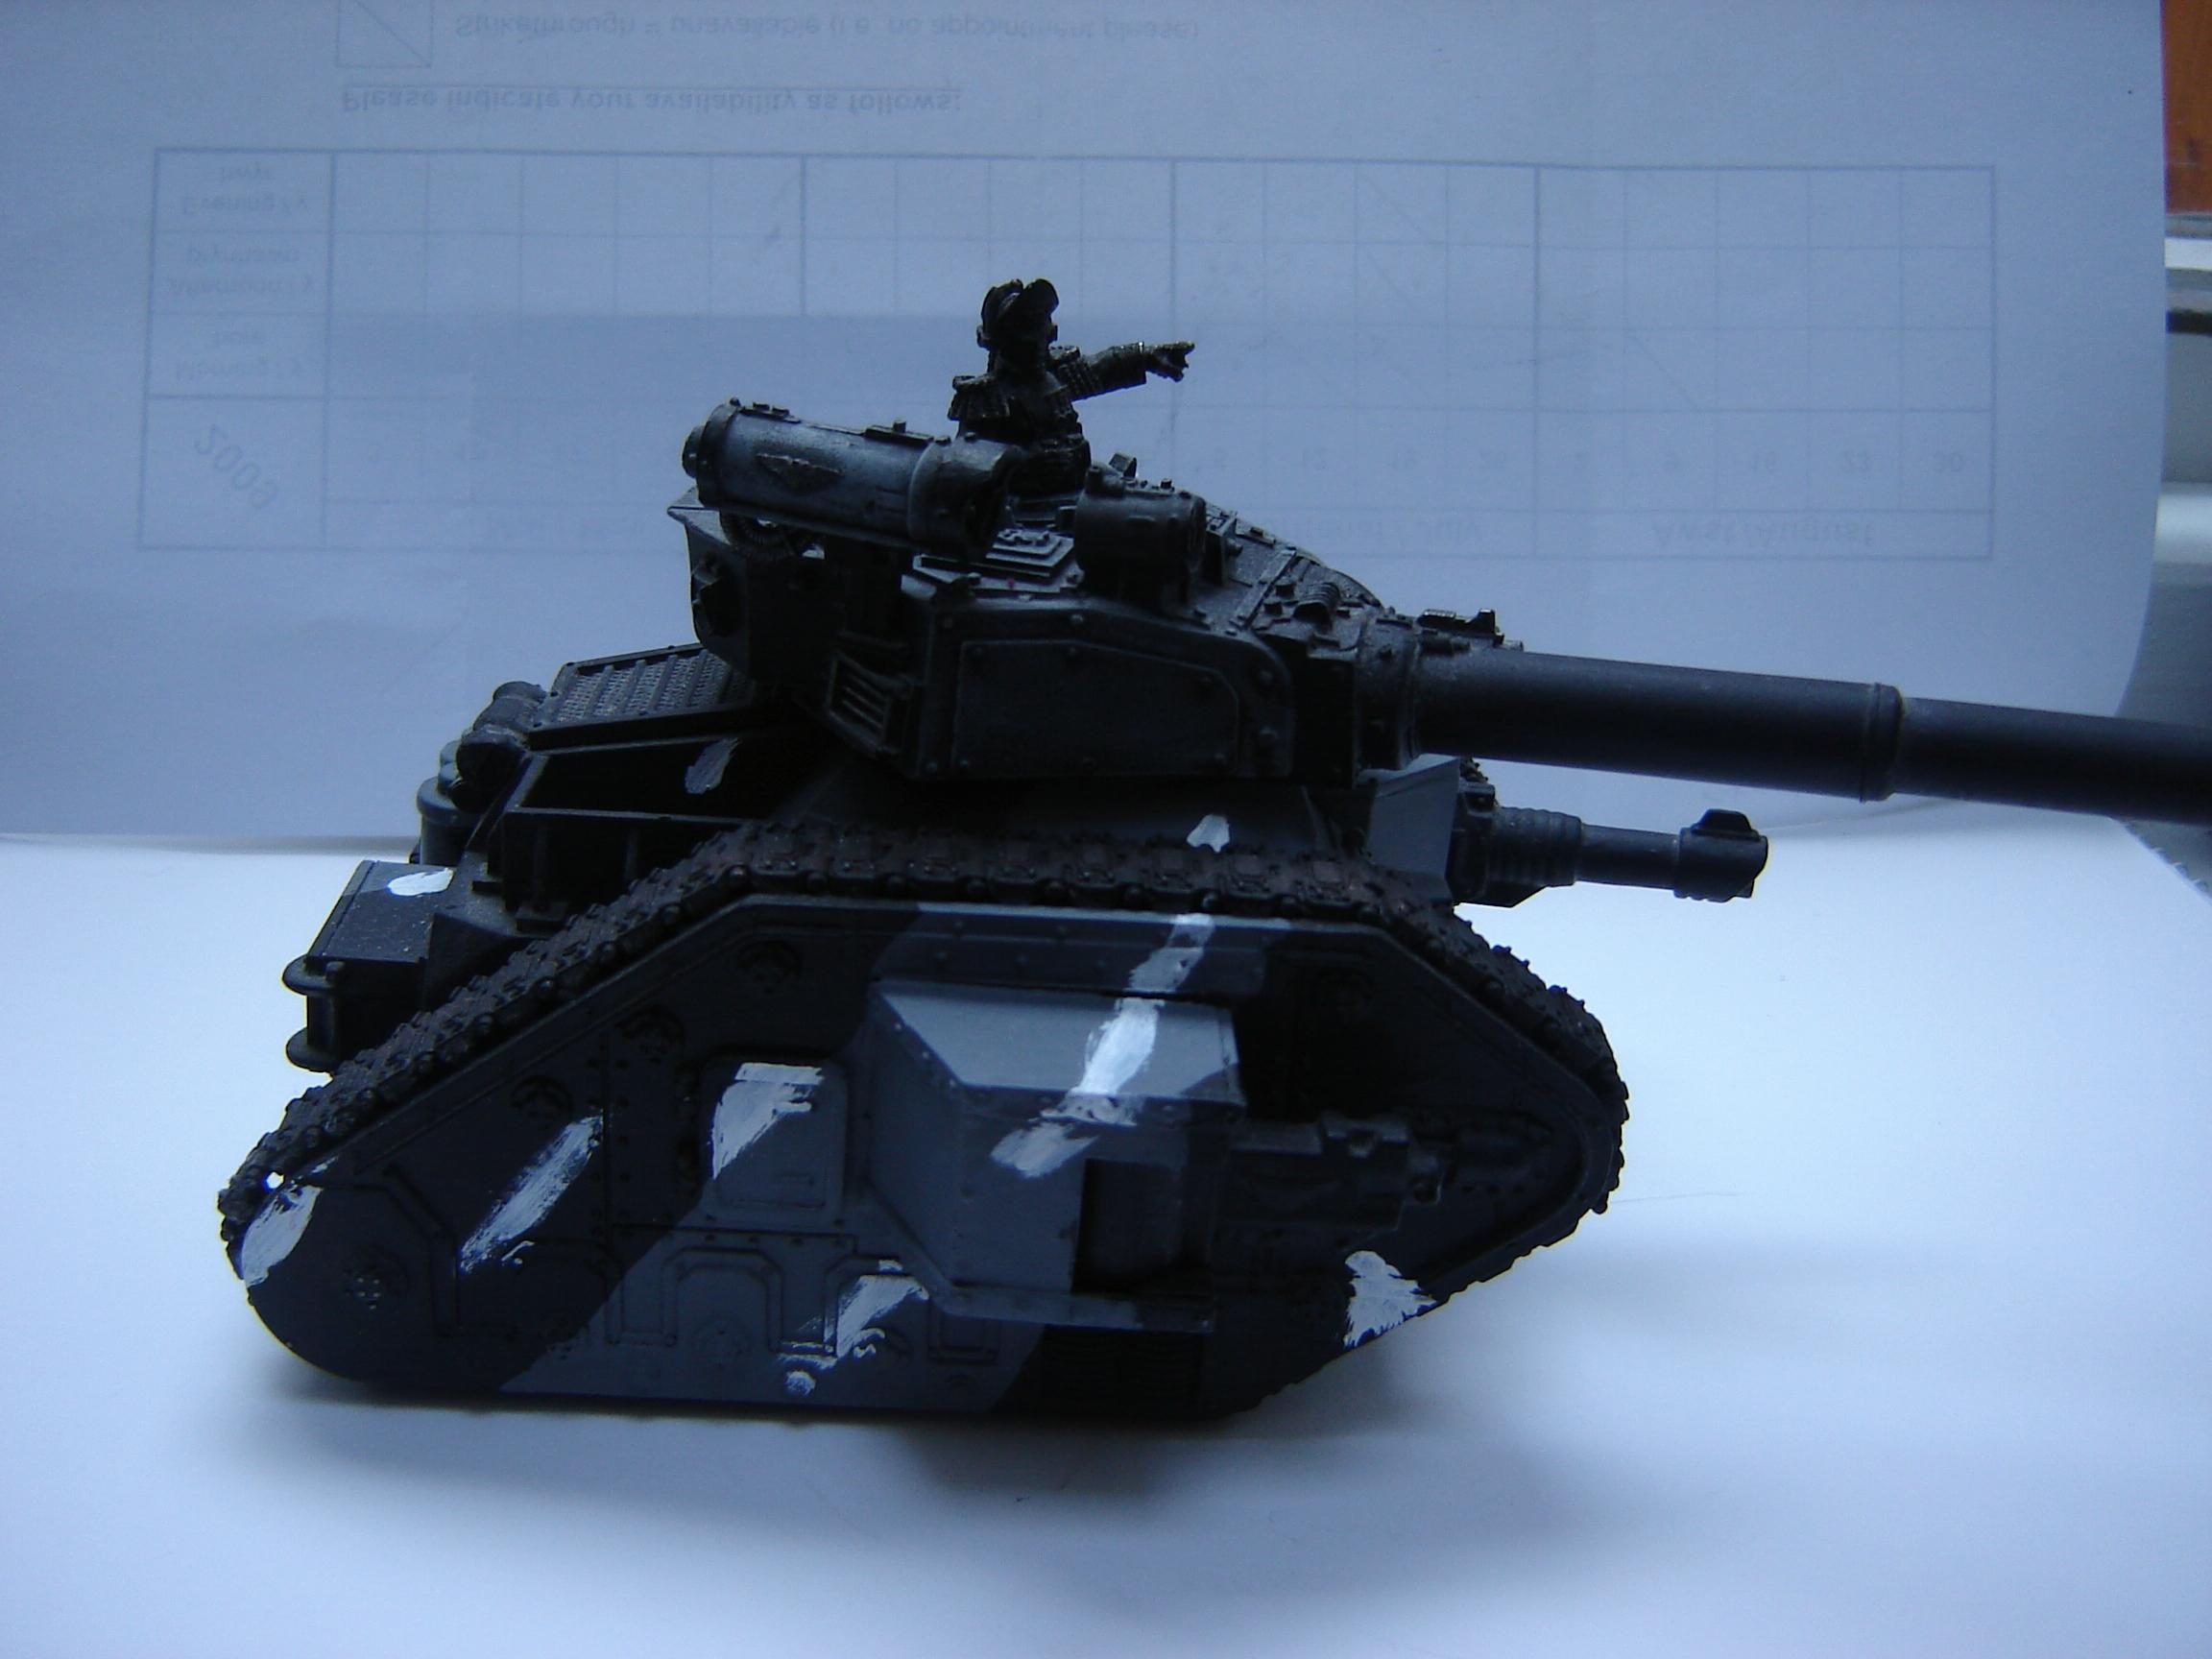 Armored Company, Imperial Guard, Leman Russ, Tank, Urban Camo, Vanquisher, Warhammer 40,000, Work In Progress